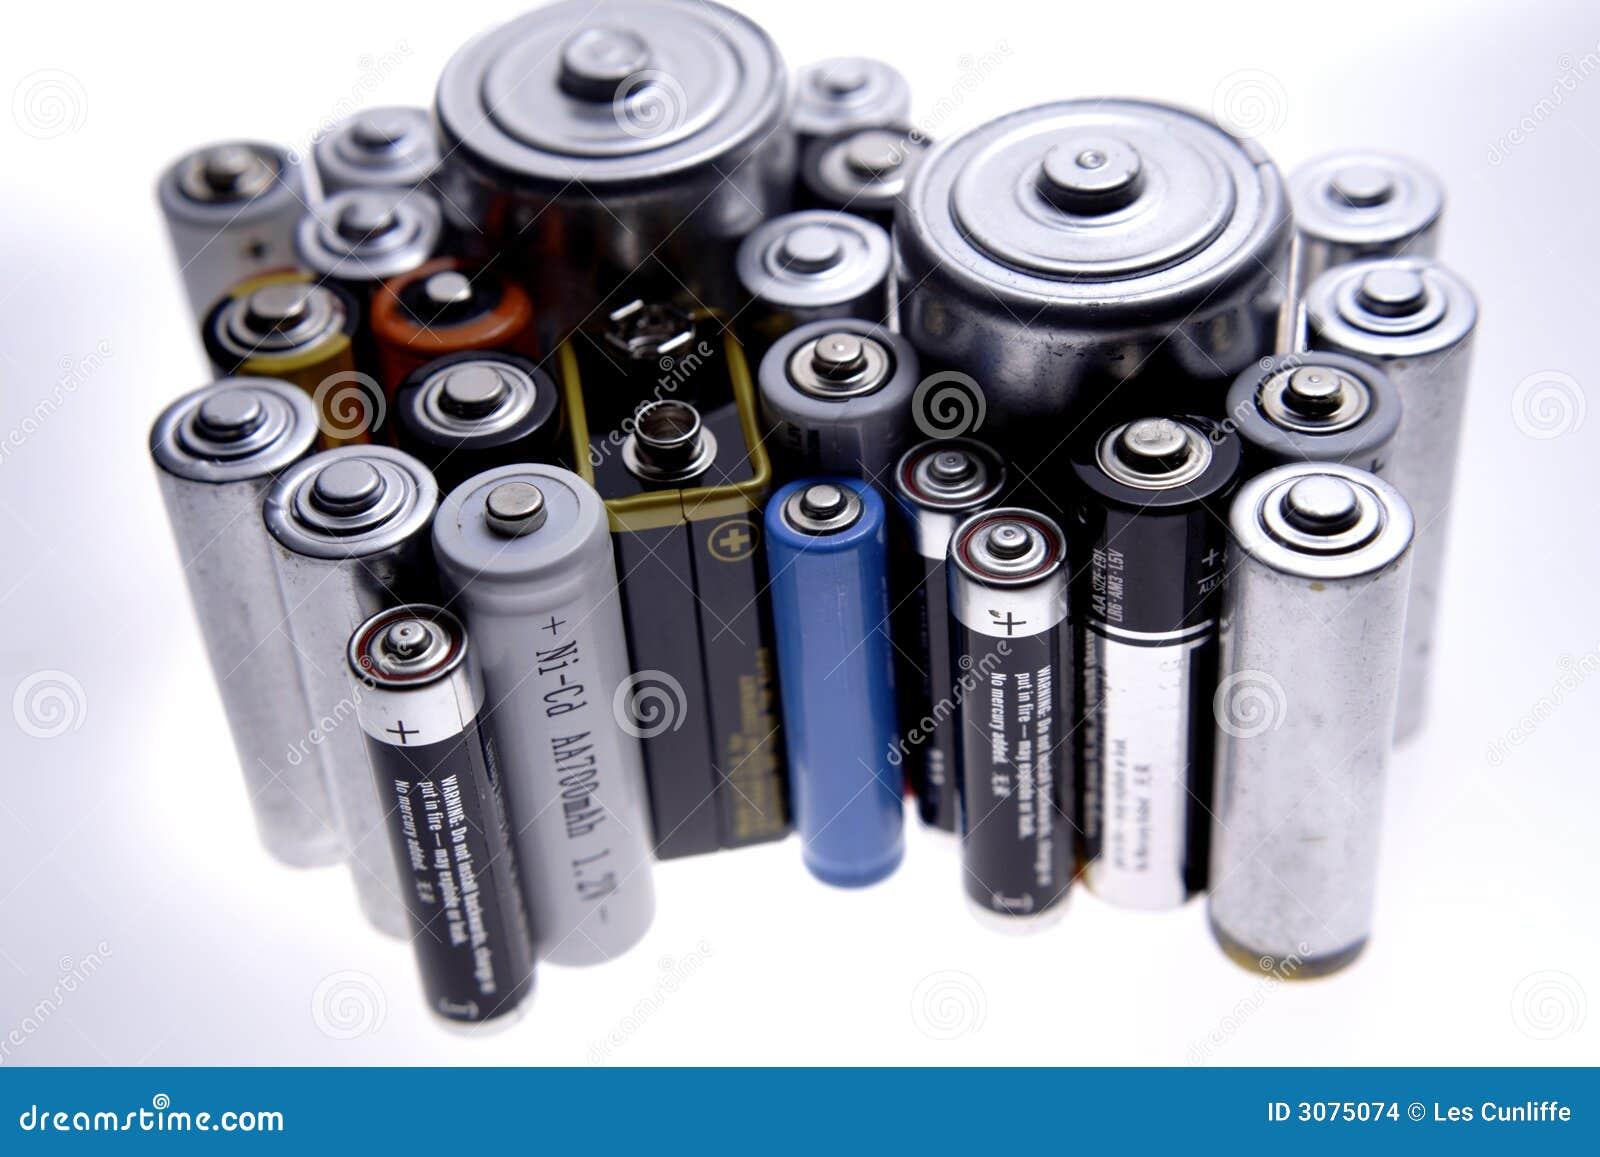 Tesla Solar Battery >> Batteries Stock Images - Image: 3075074